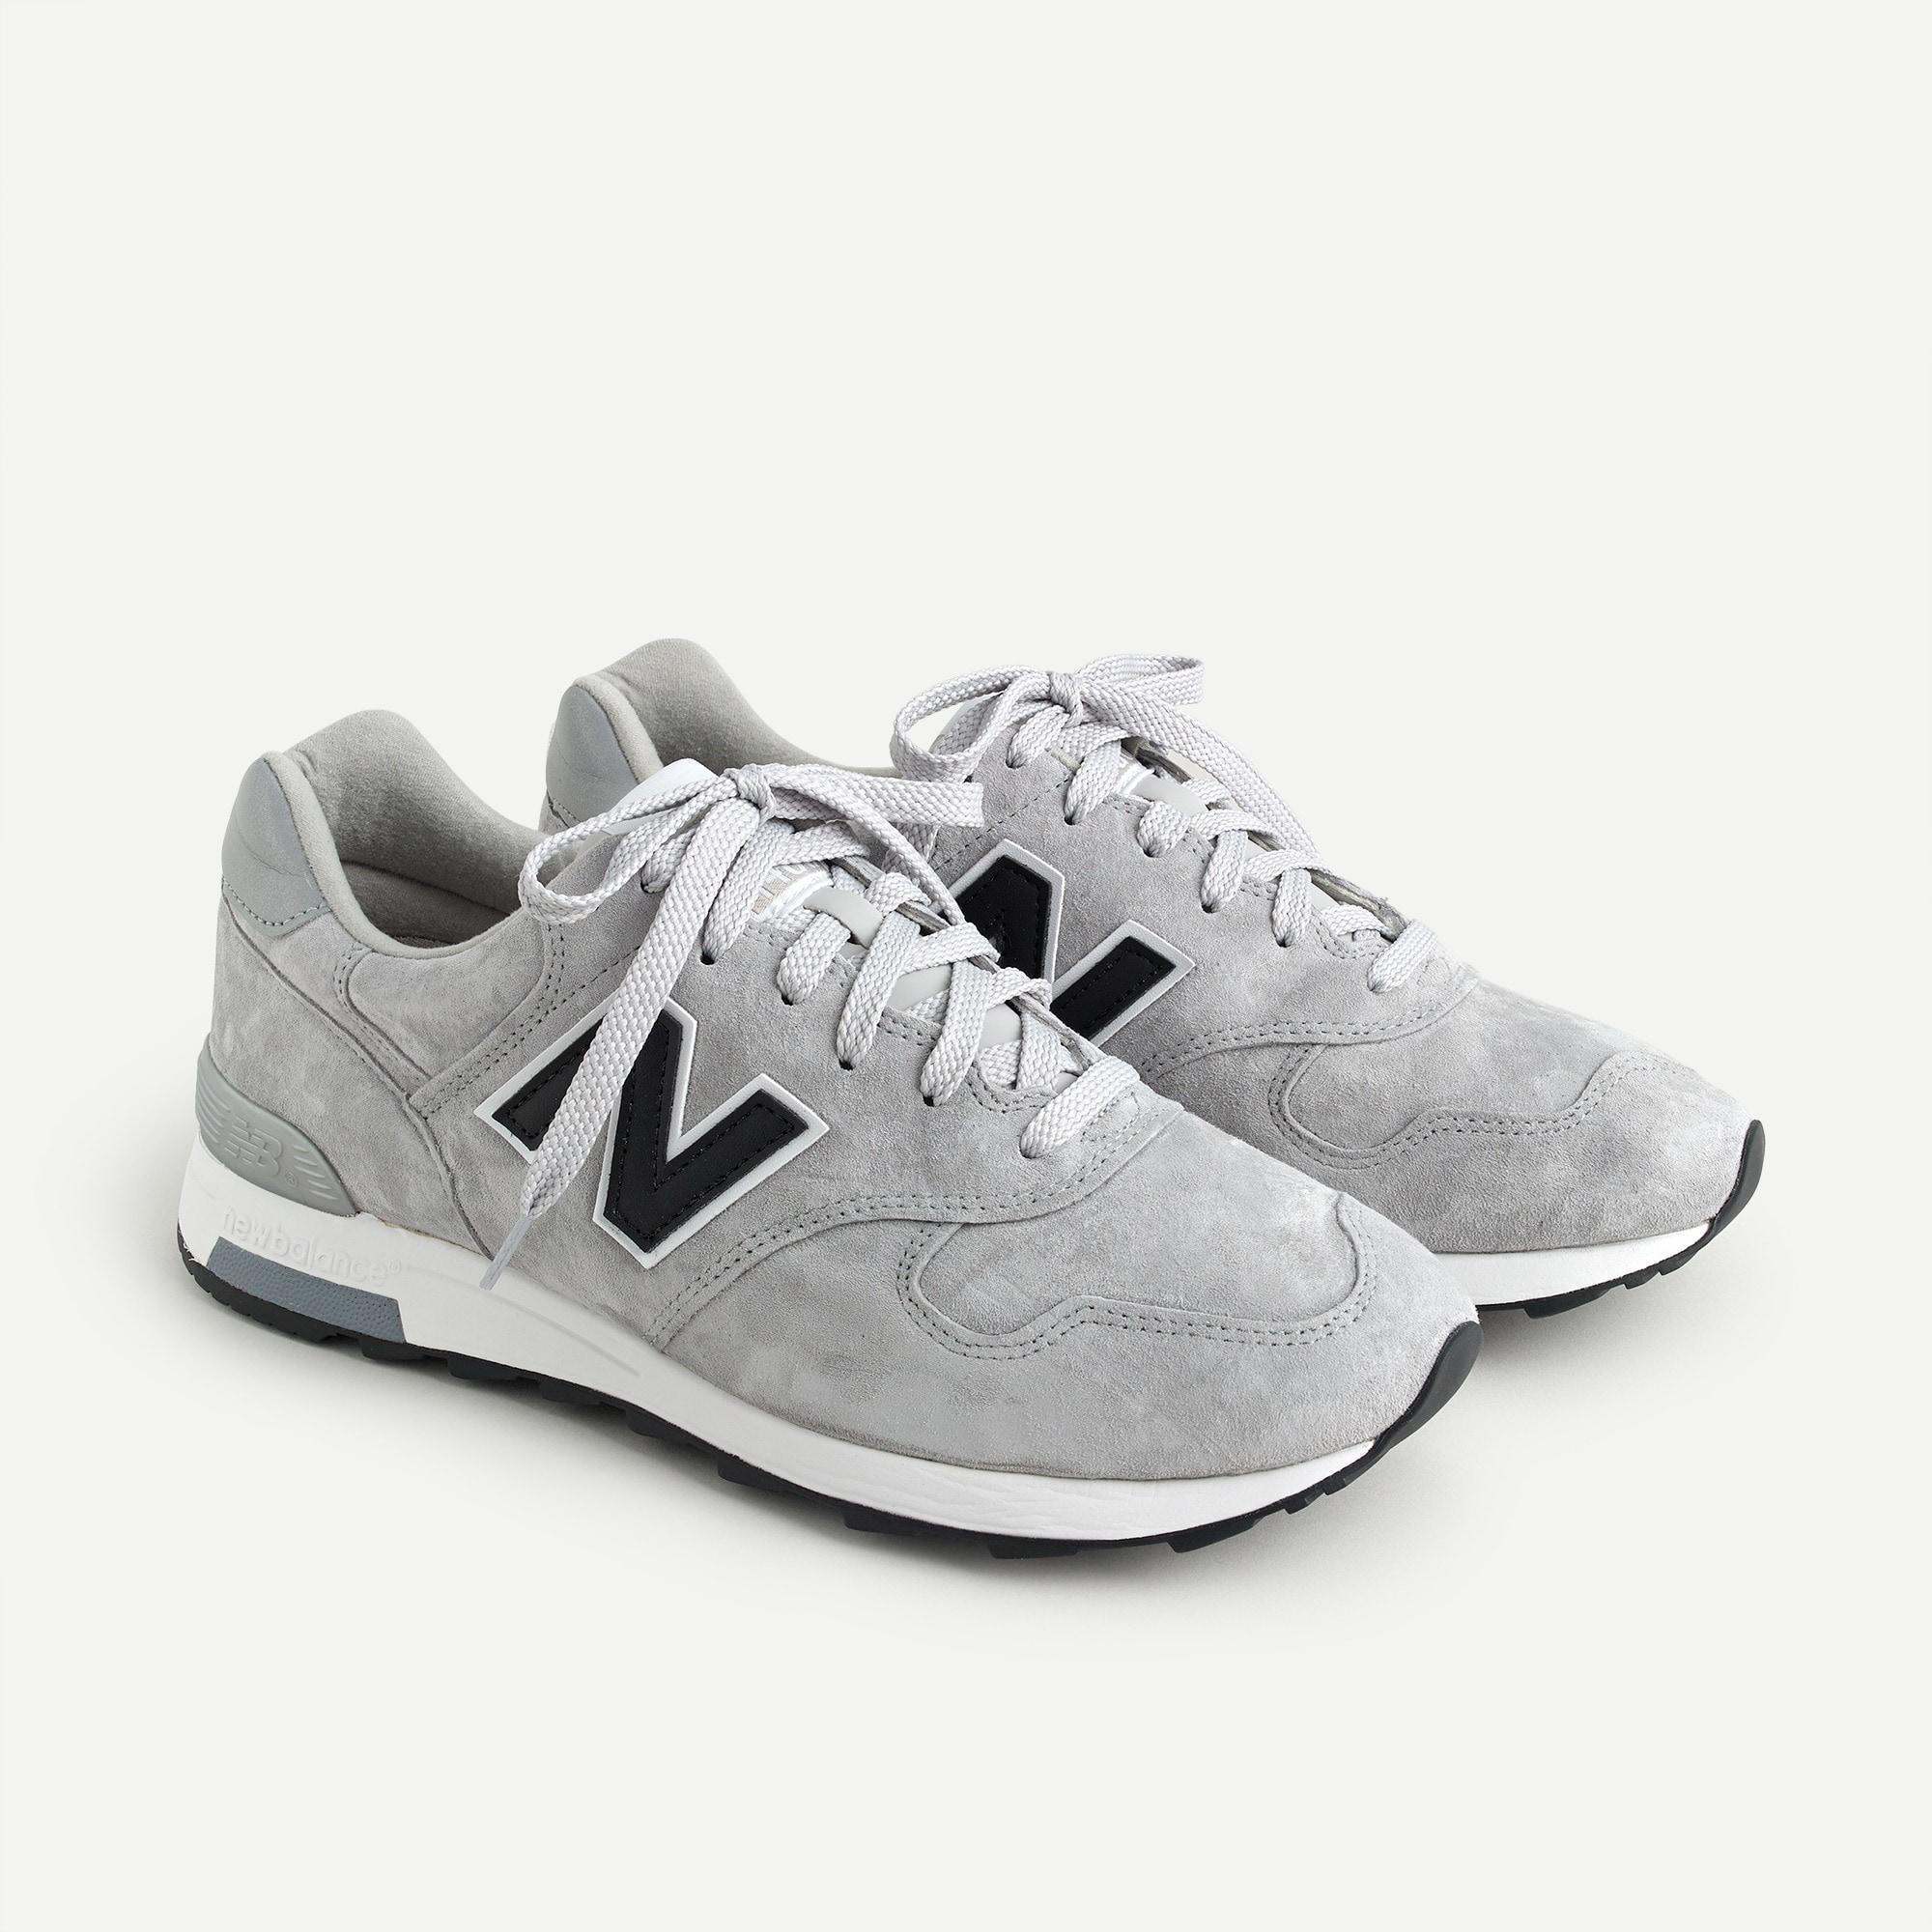 ® X J.crew 1400 Sneakers